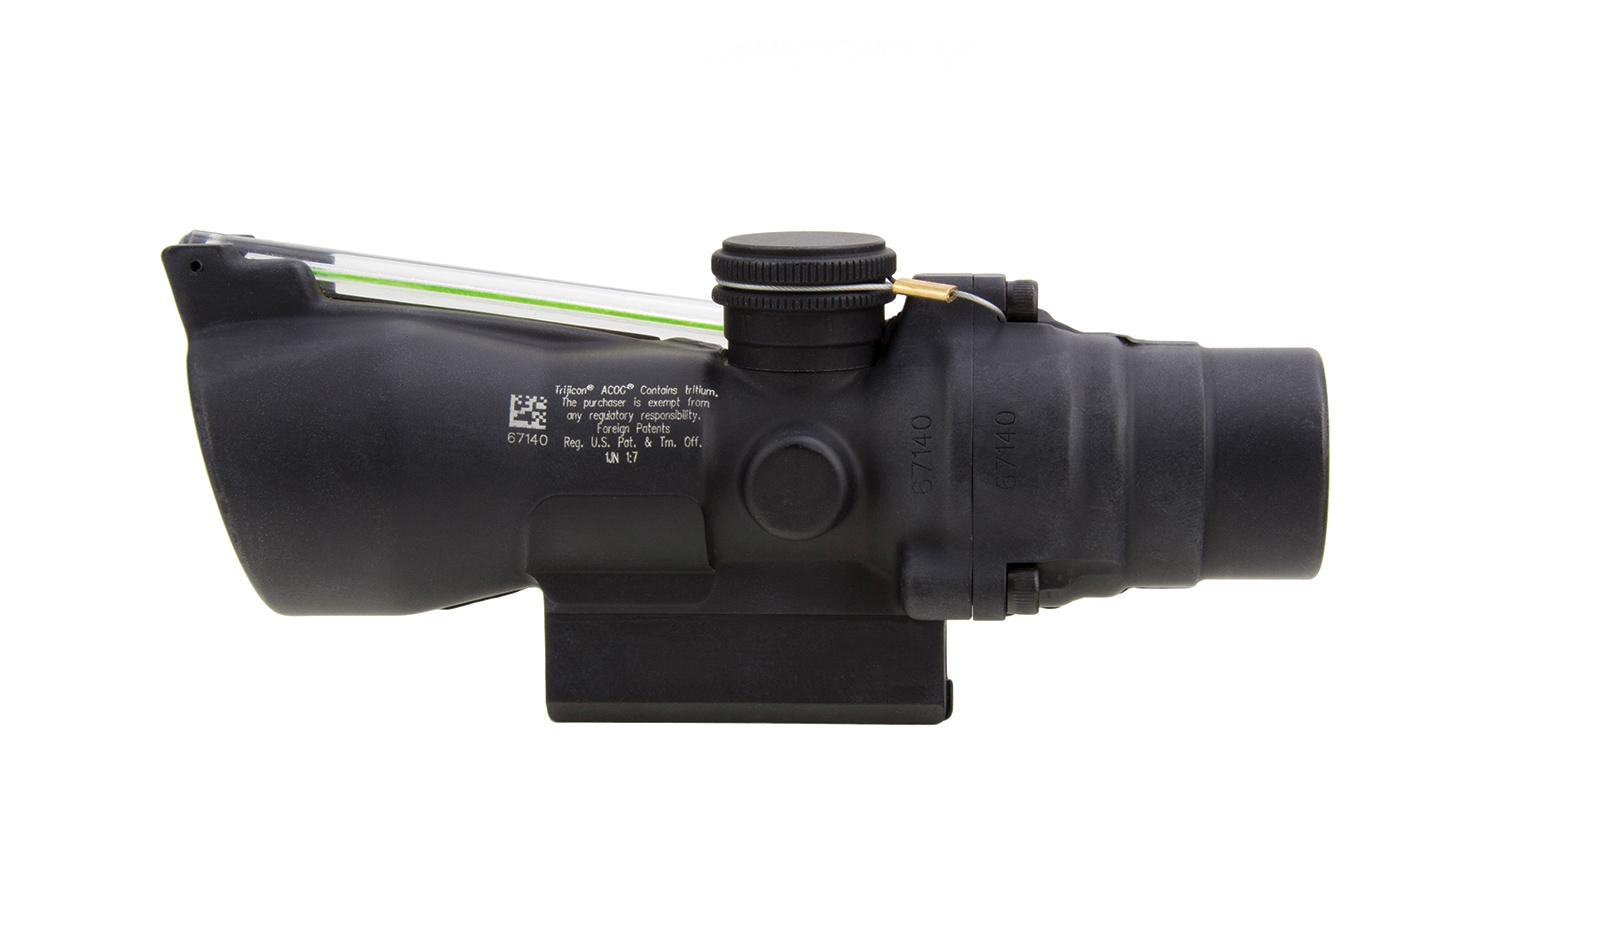 TA50-C-400143 angle 2